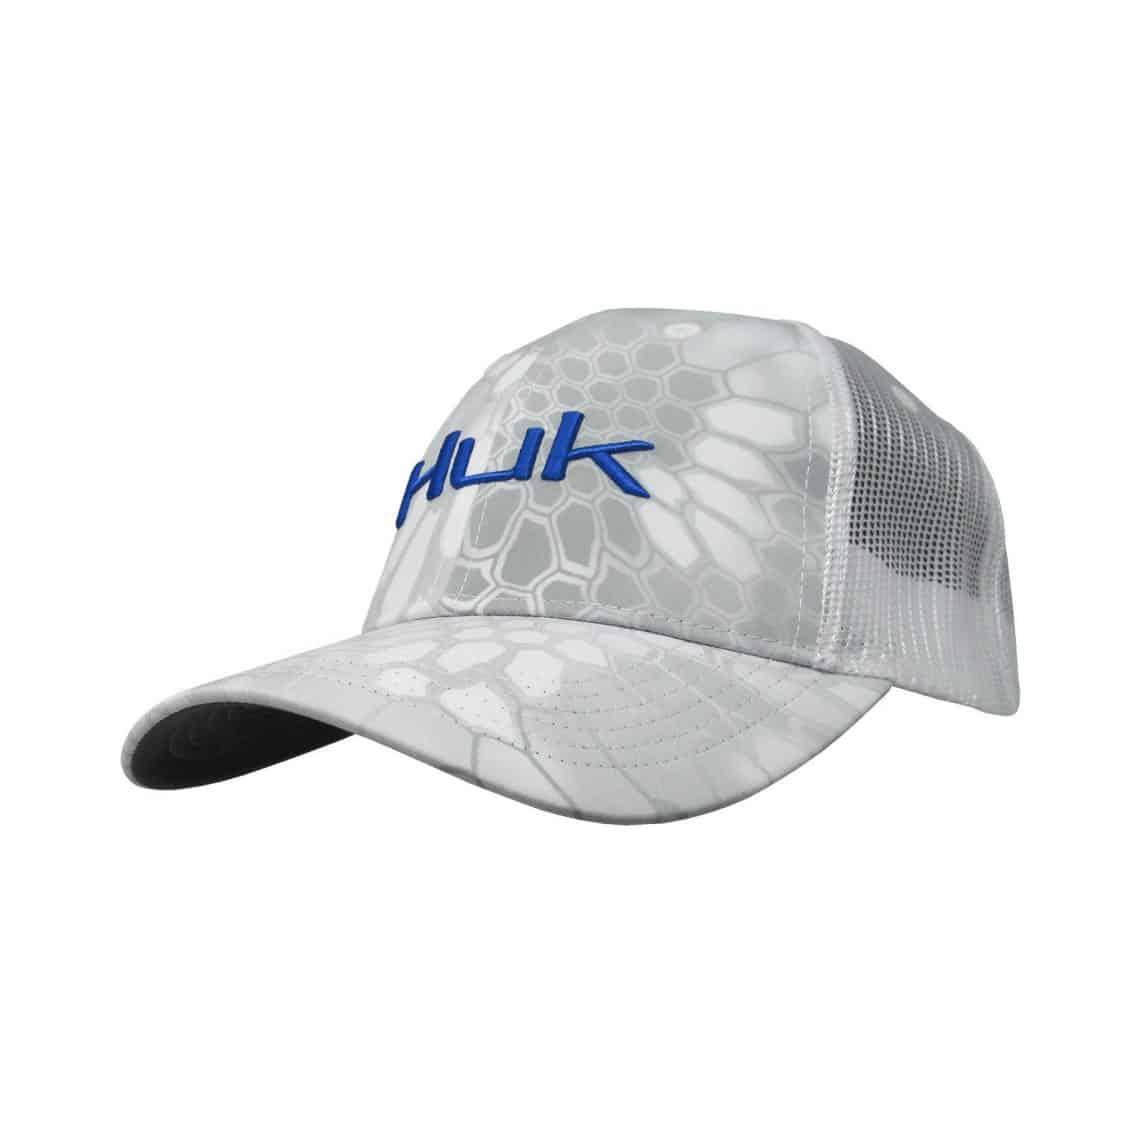 Huk kryptek logo trucker cap northwoods wholesale outlet for Huk fishing hats